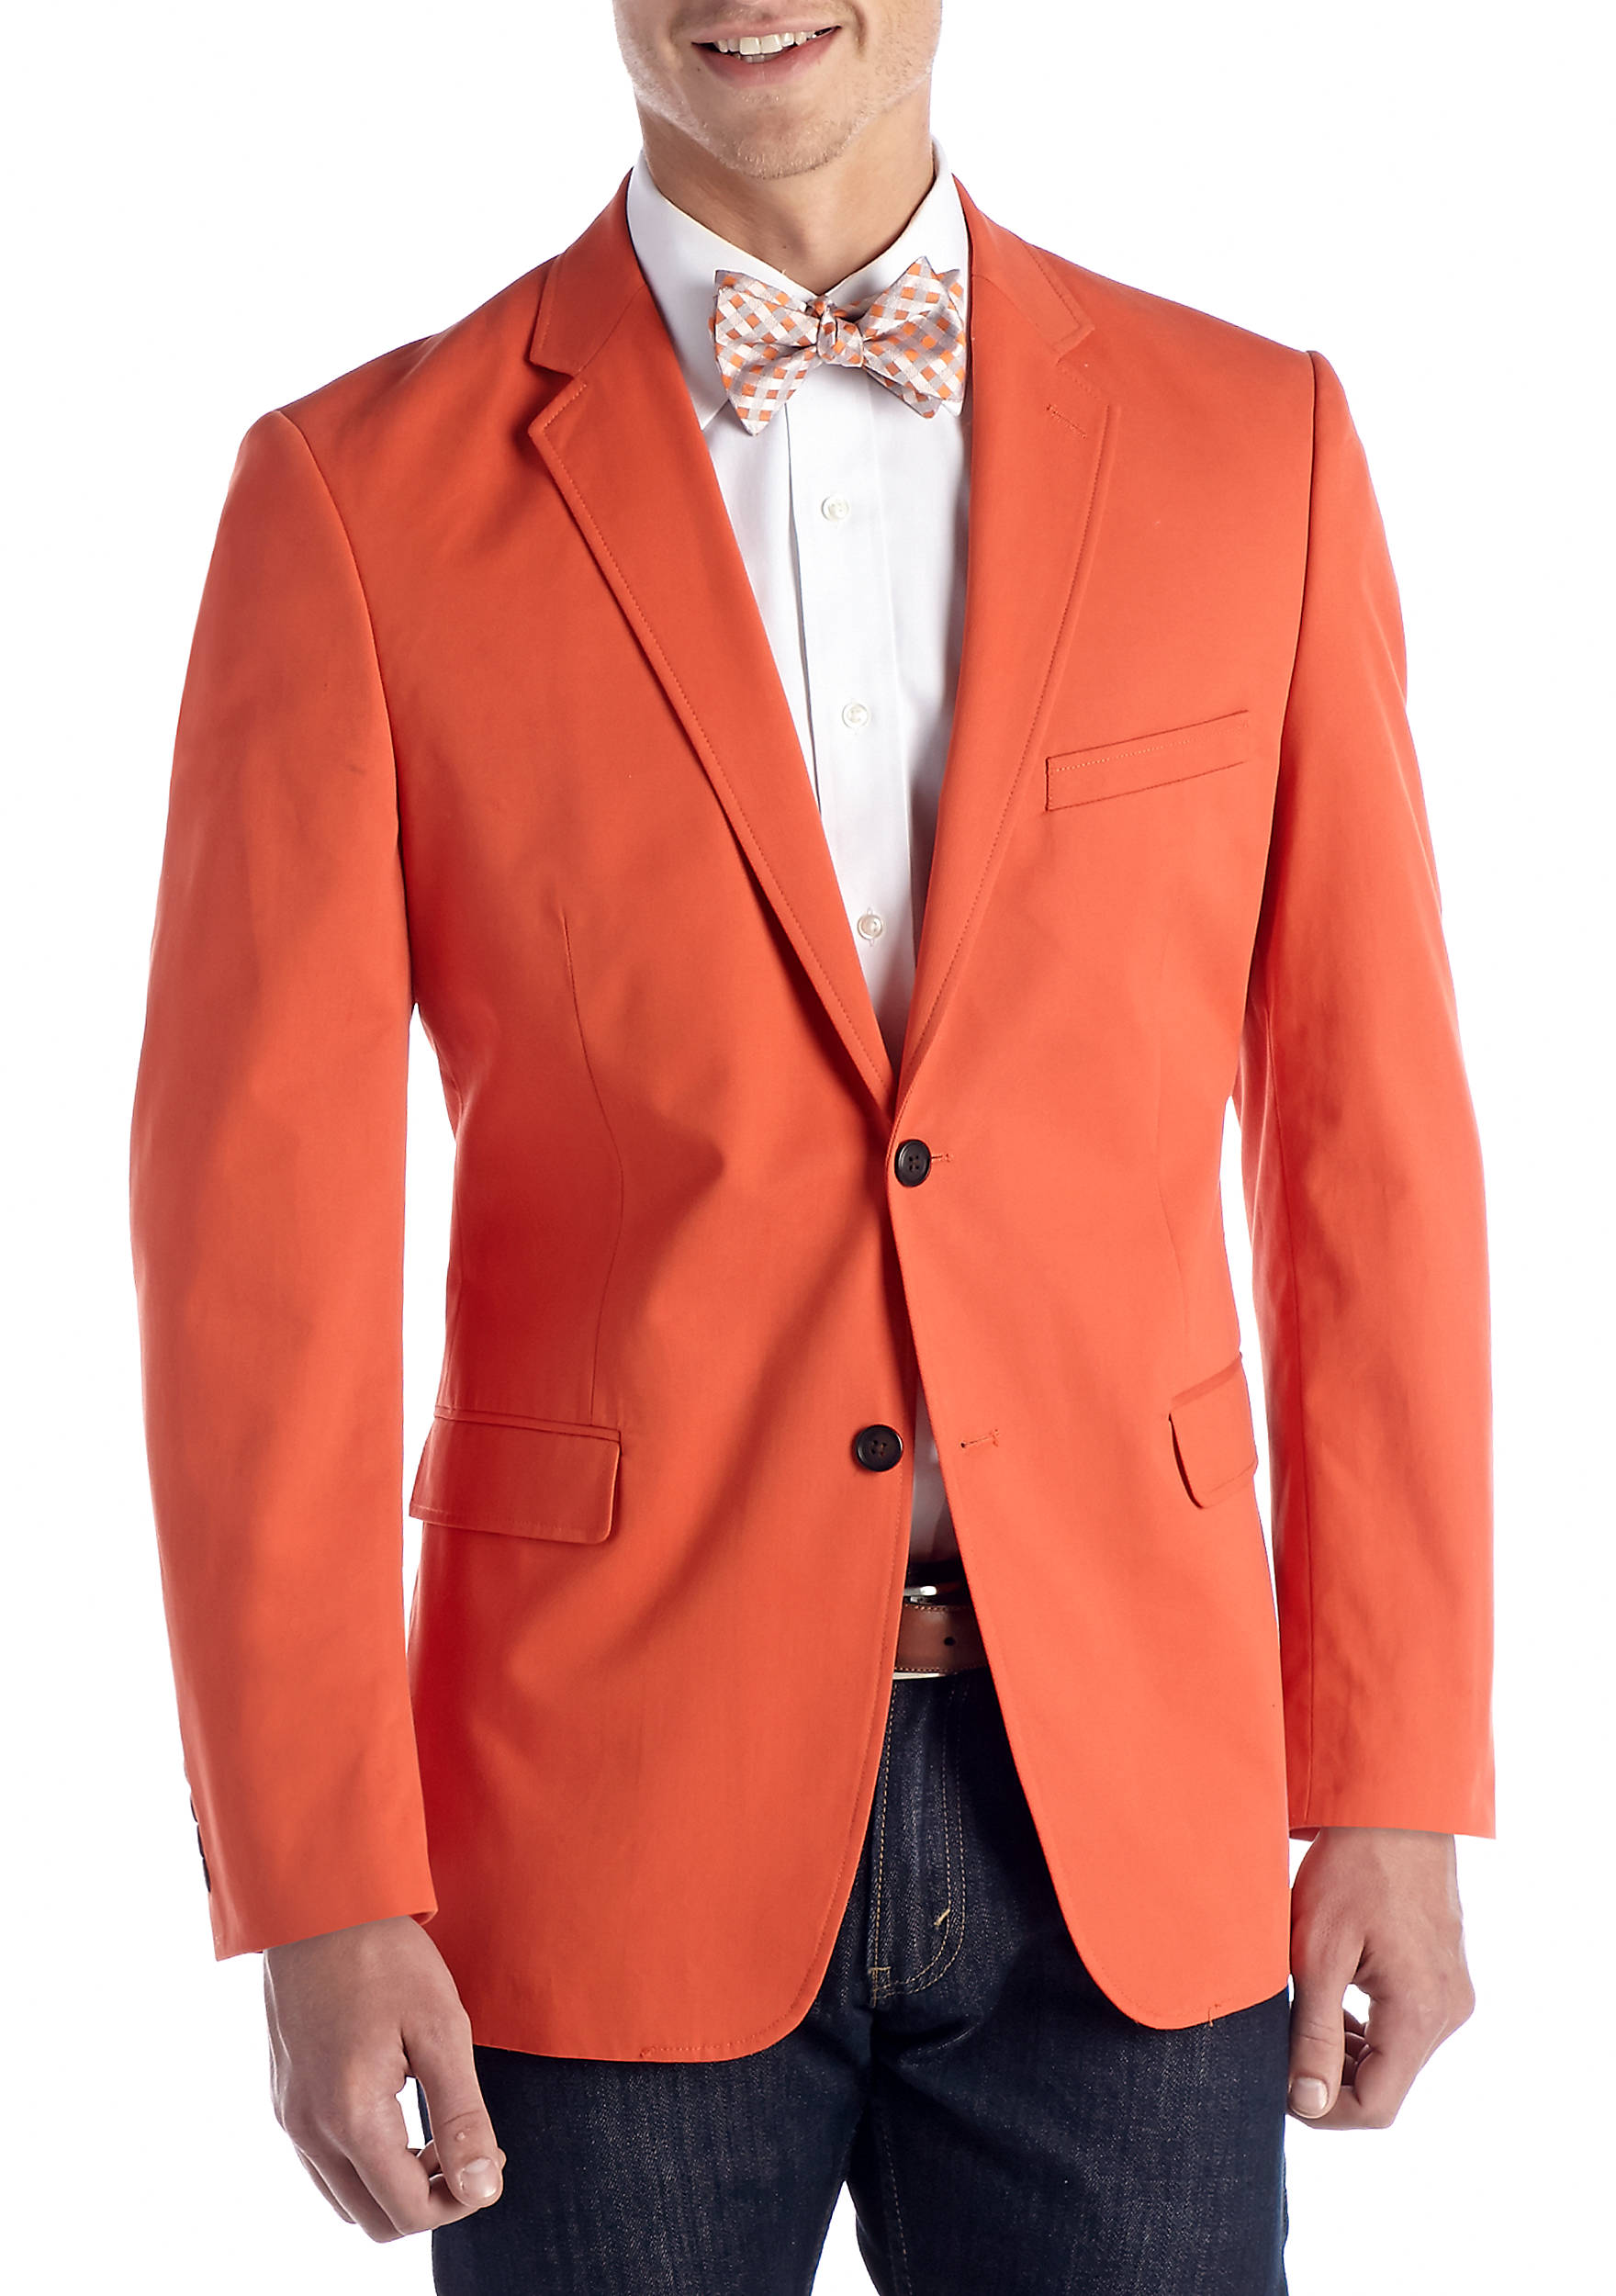 Saddlebred® Classic-Fit Cotton Oxford Mid Orange Blazer | belk